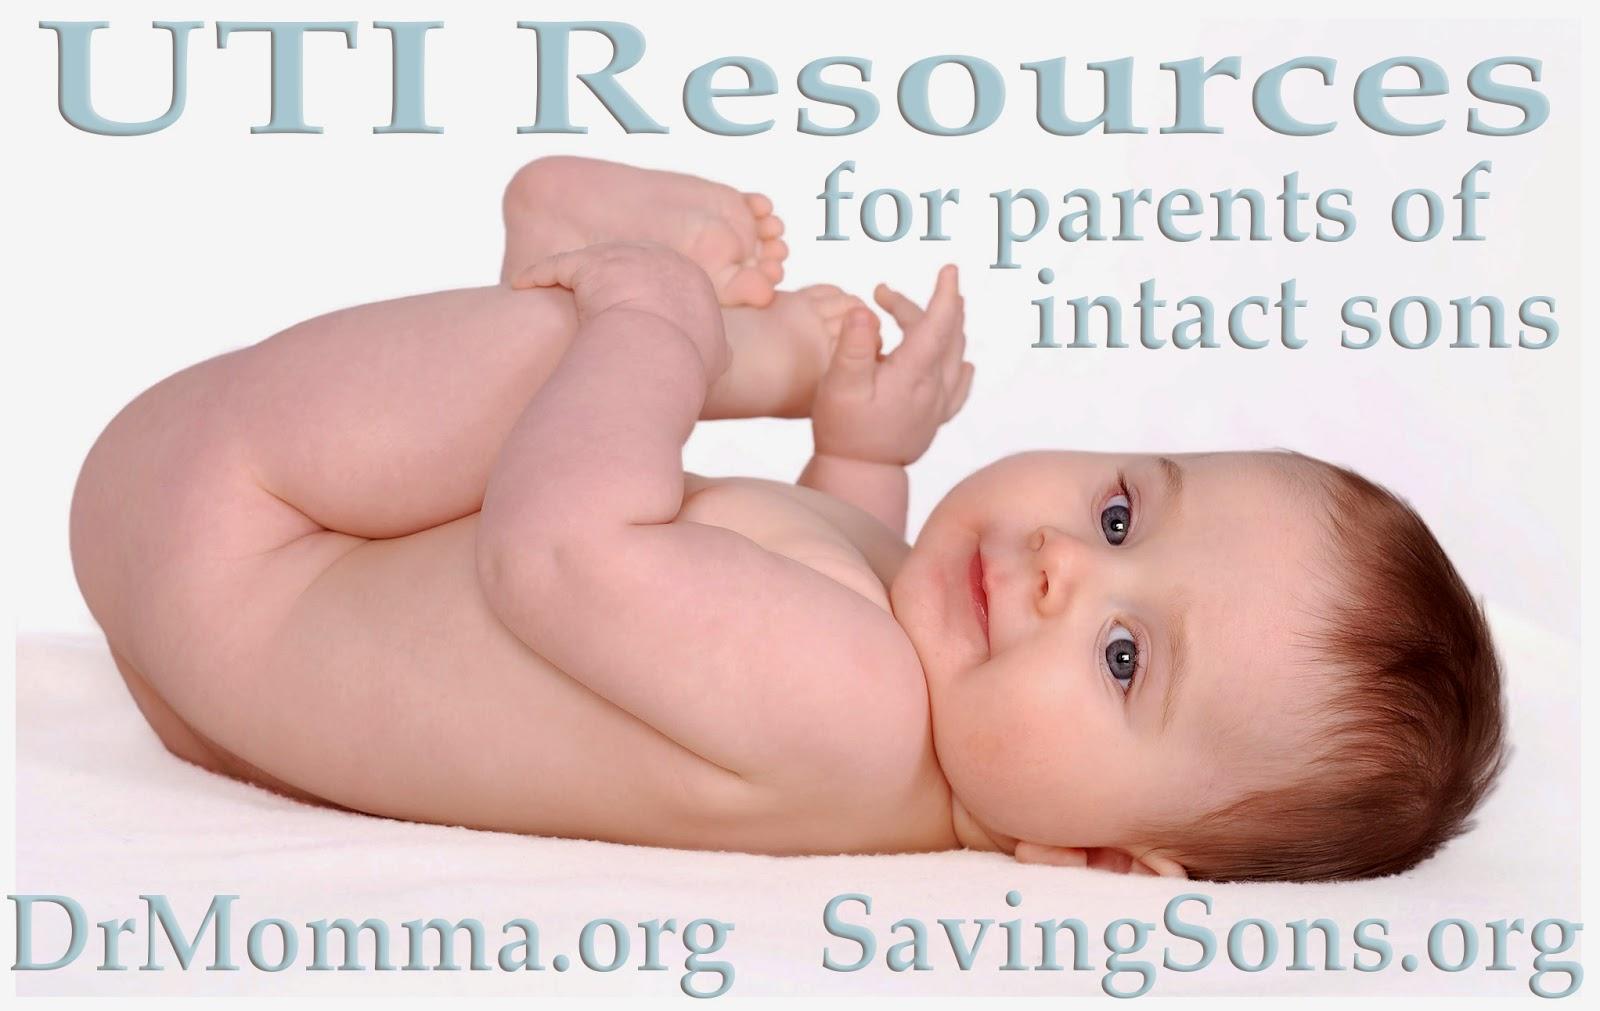 Infants suckling penis-3332